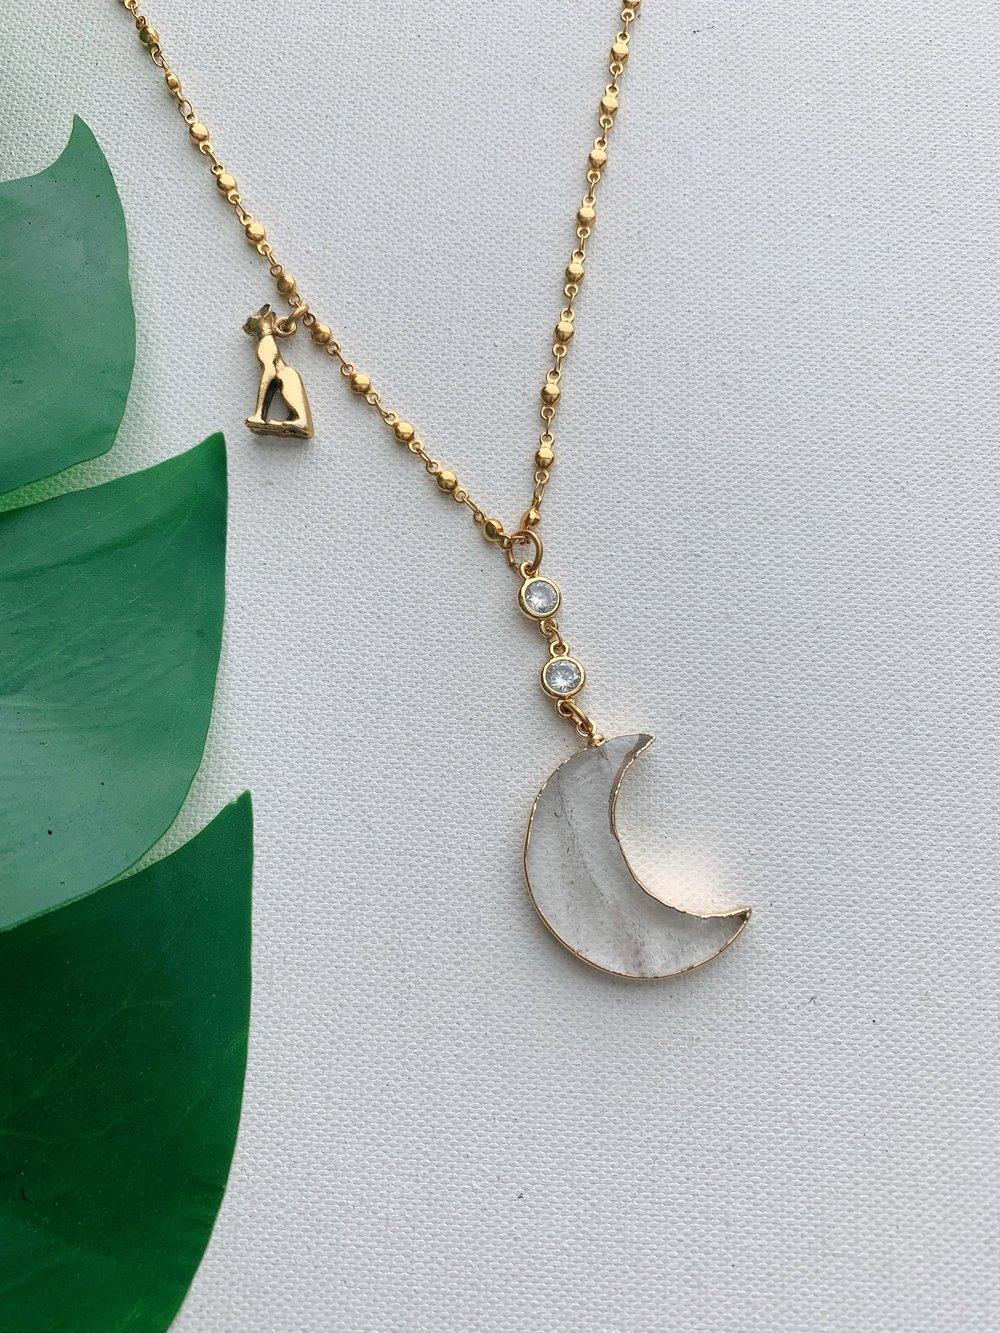 Image of MOON JUICE • Clear Quartz Moon Necklace